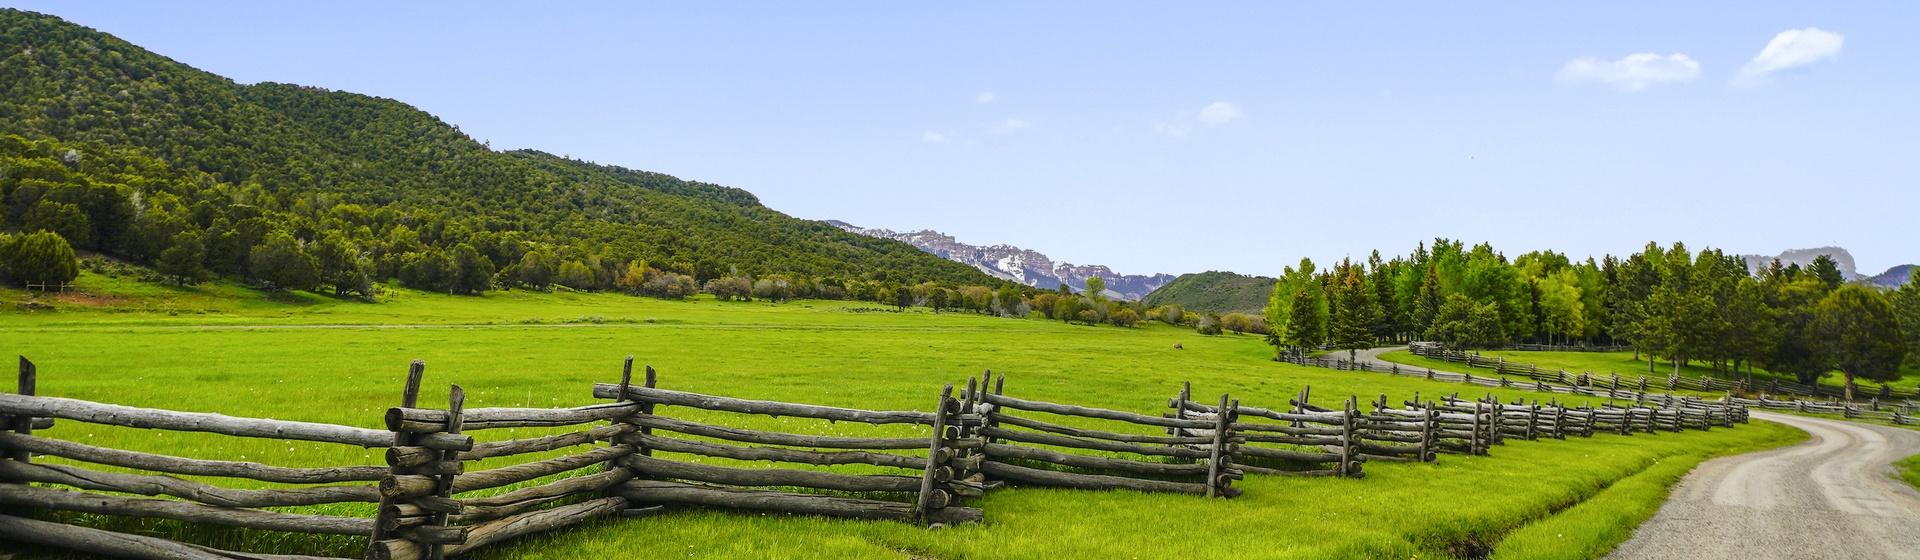 13.3-Telluride-Sleeping-Indian-Ranch-driveway-2-web.JPG